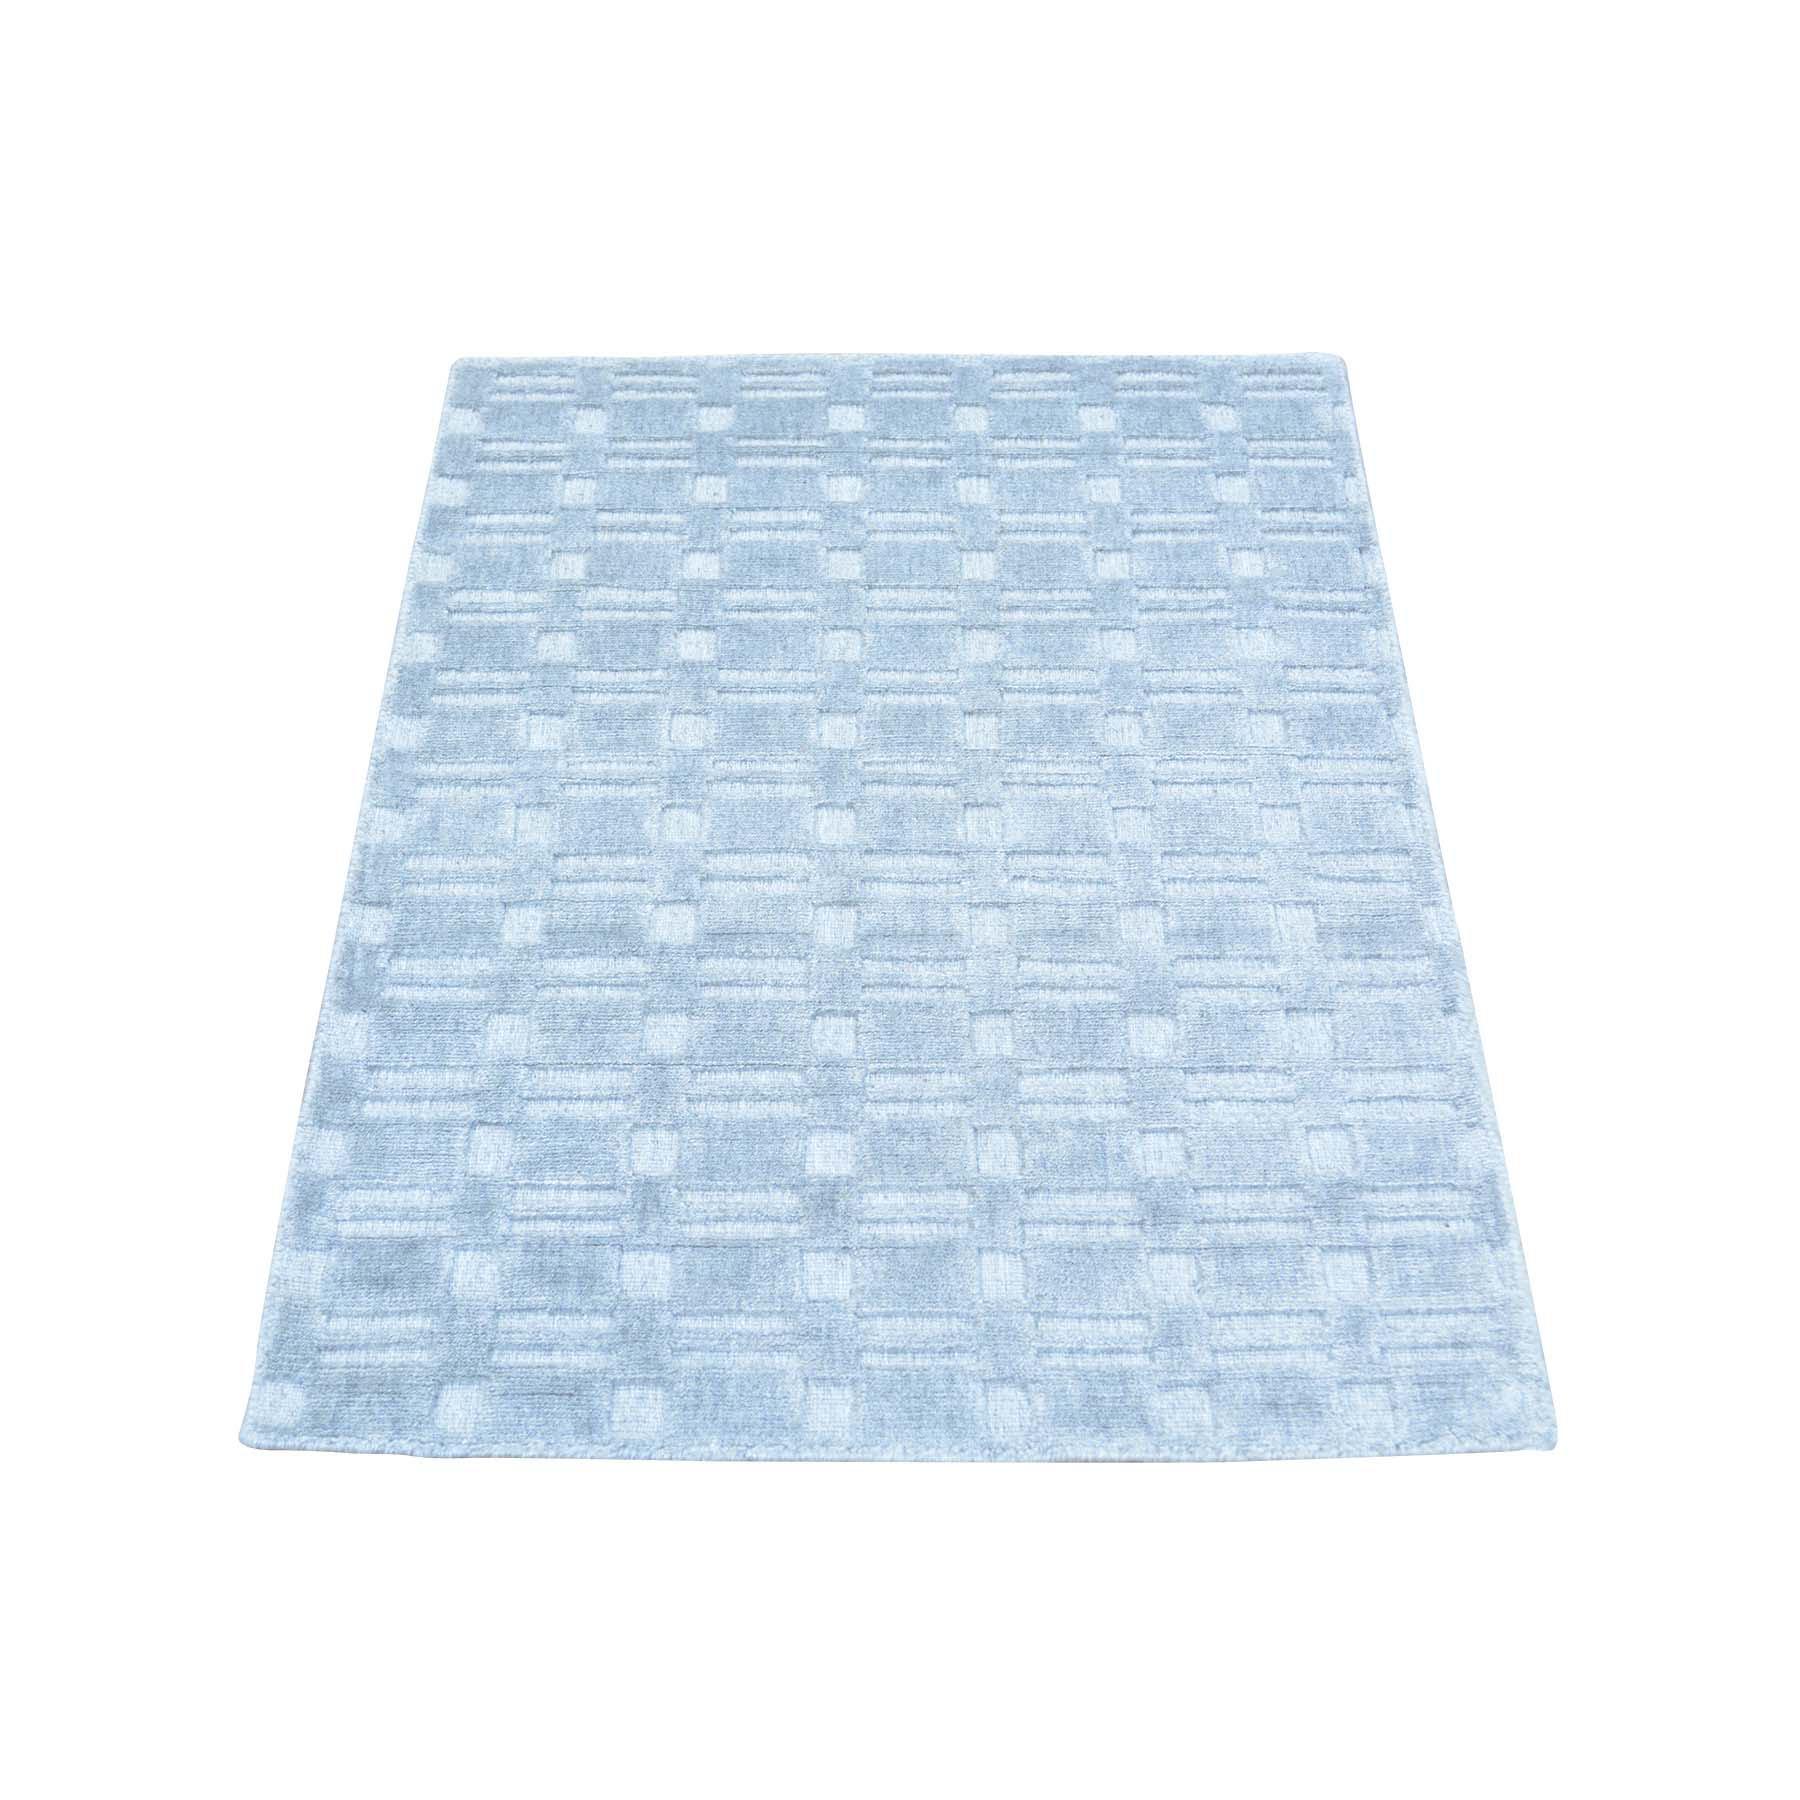 2'X3' Tone On Tone Grey Wool And Silk Hand Loomed Rug moab99e0